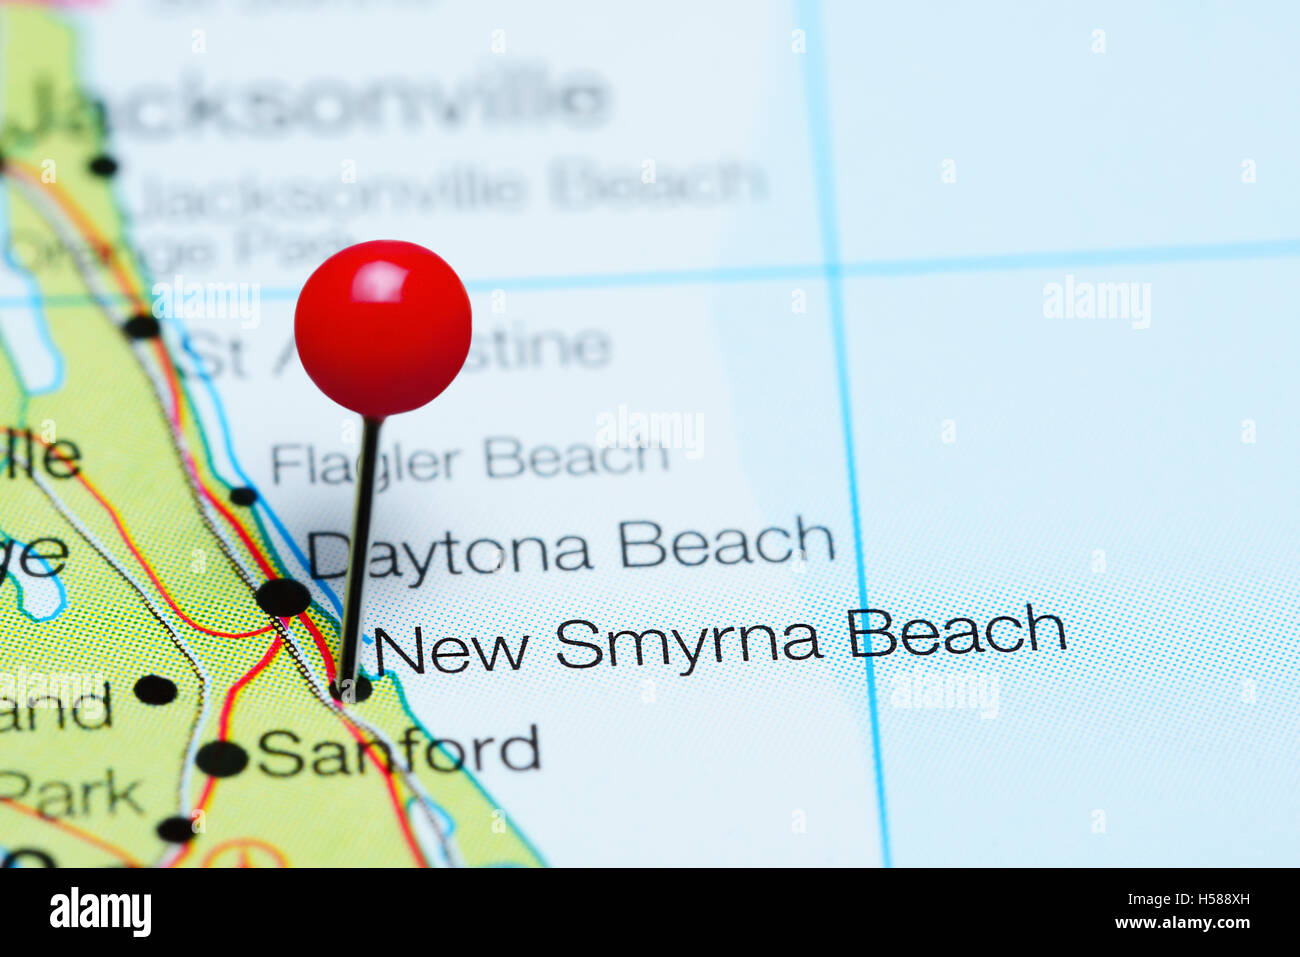 New Smyrna Beach Florida Stock s & New Smyrna Beach Florida